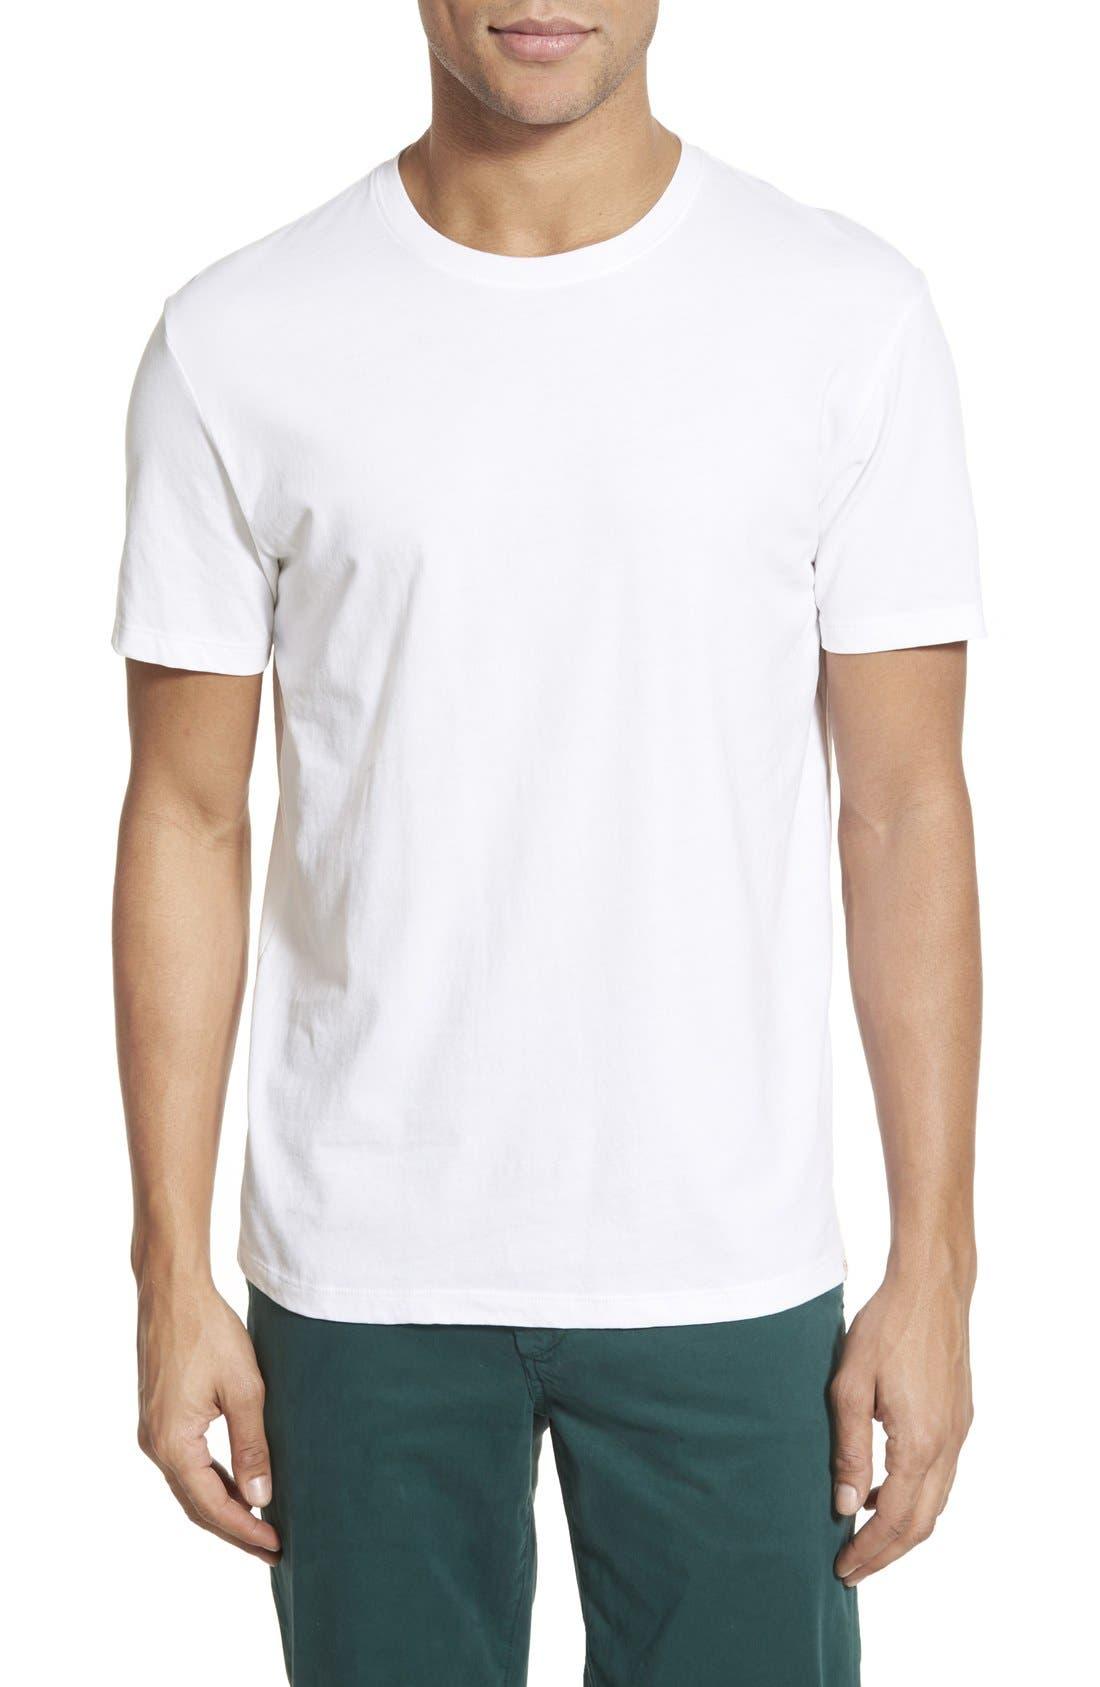 AG 'Cliff' Crewneck T-Shirt